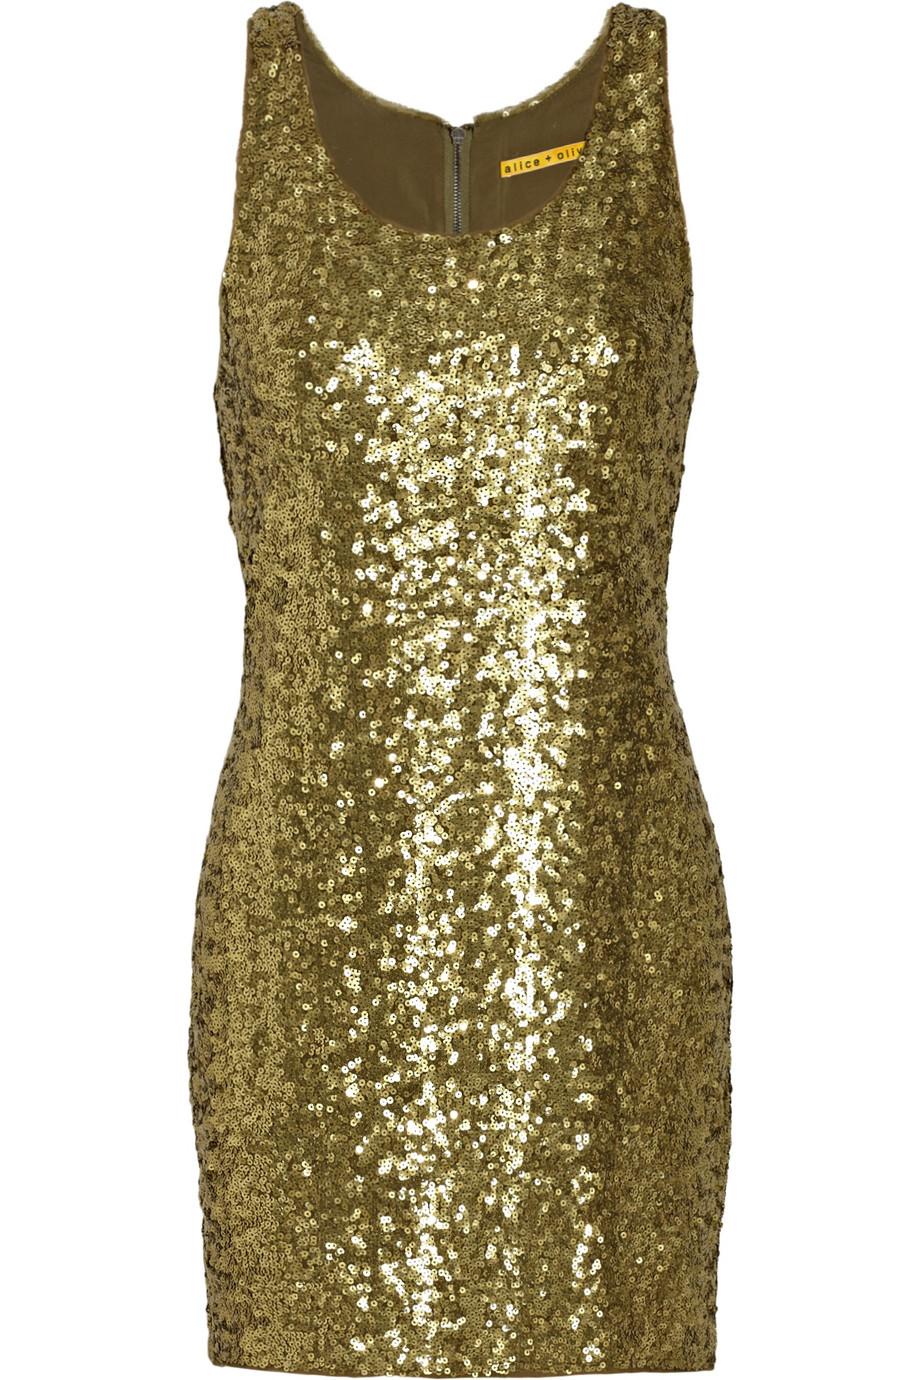 Alice   olivia Gold Sequin Tank Dress in Metallic  Lyst